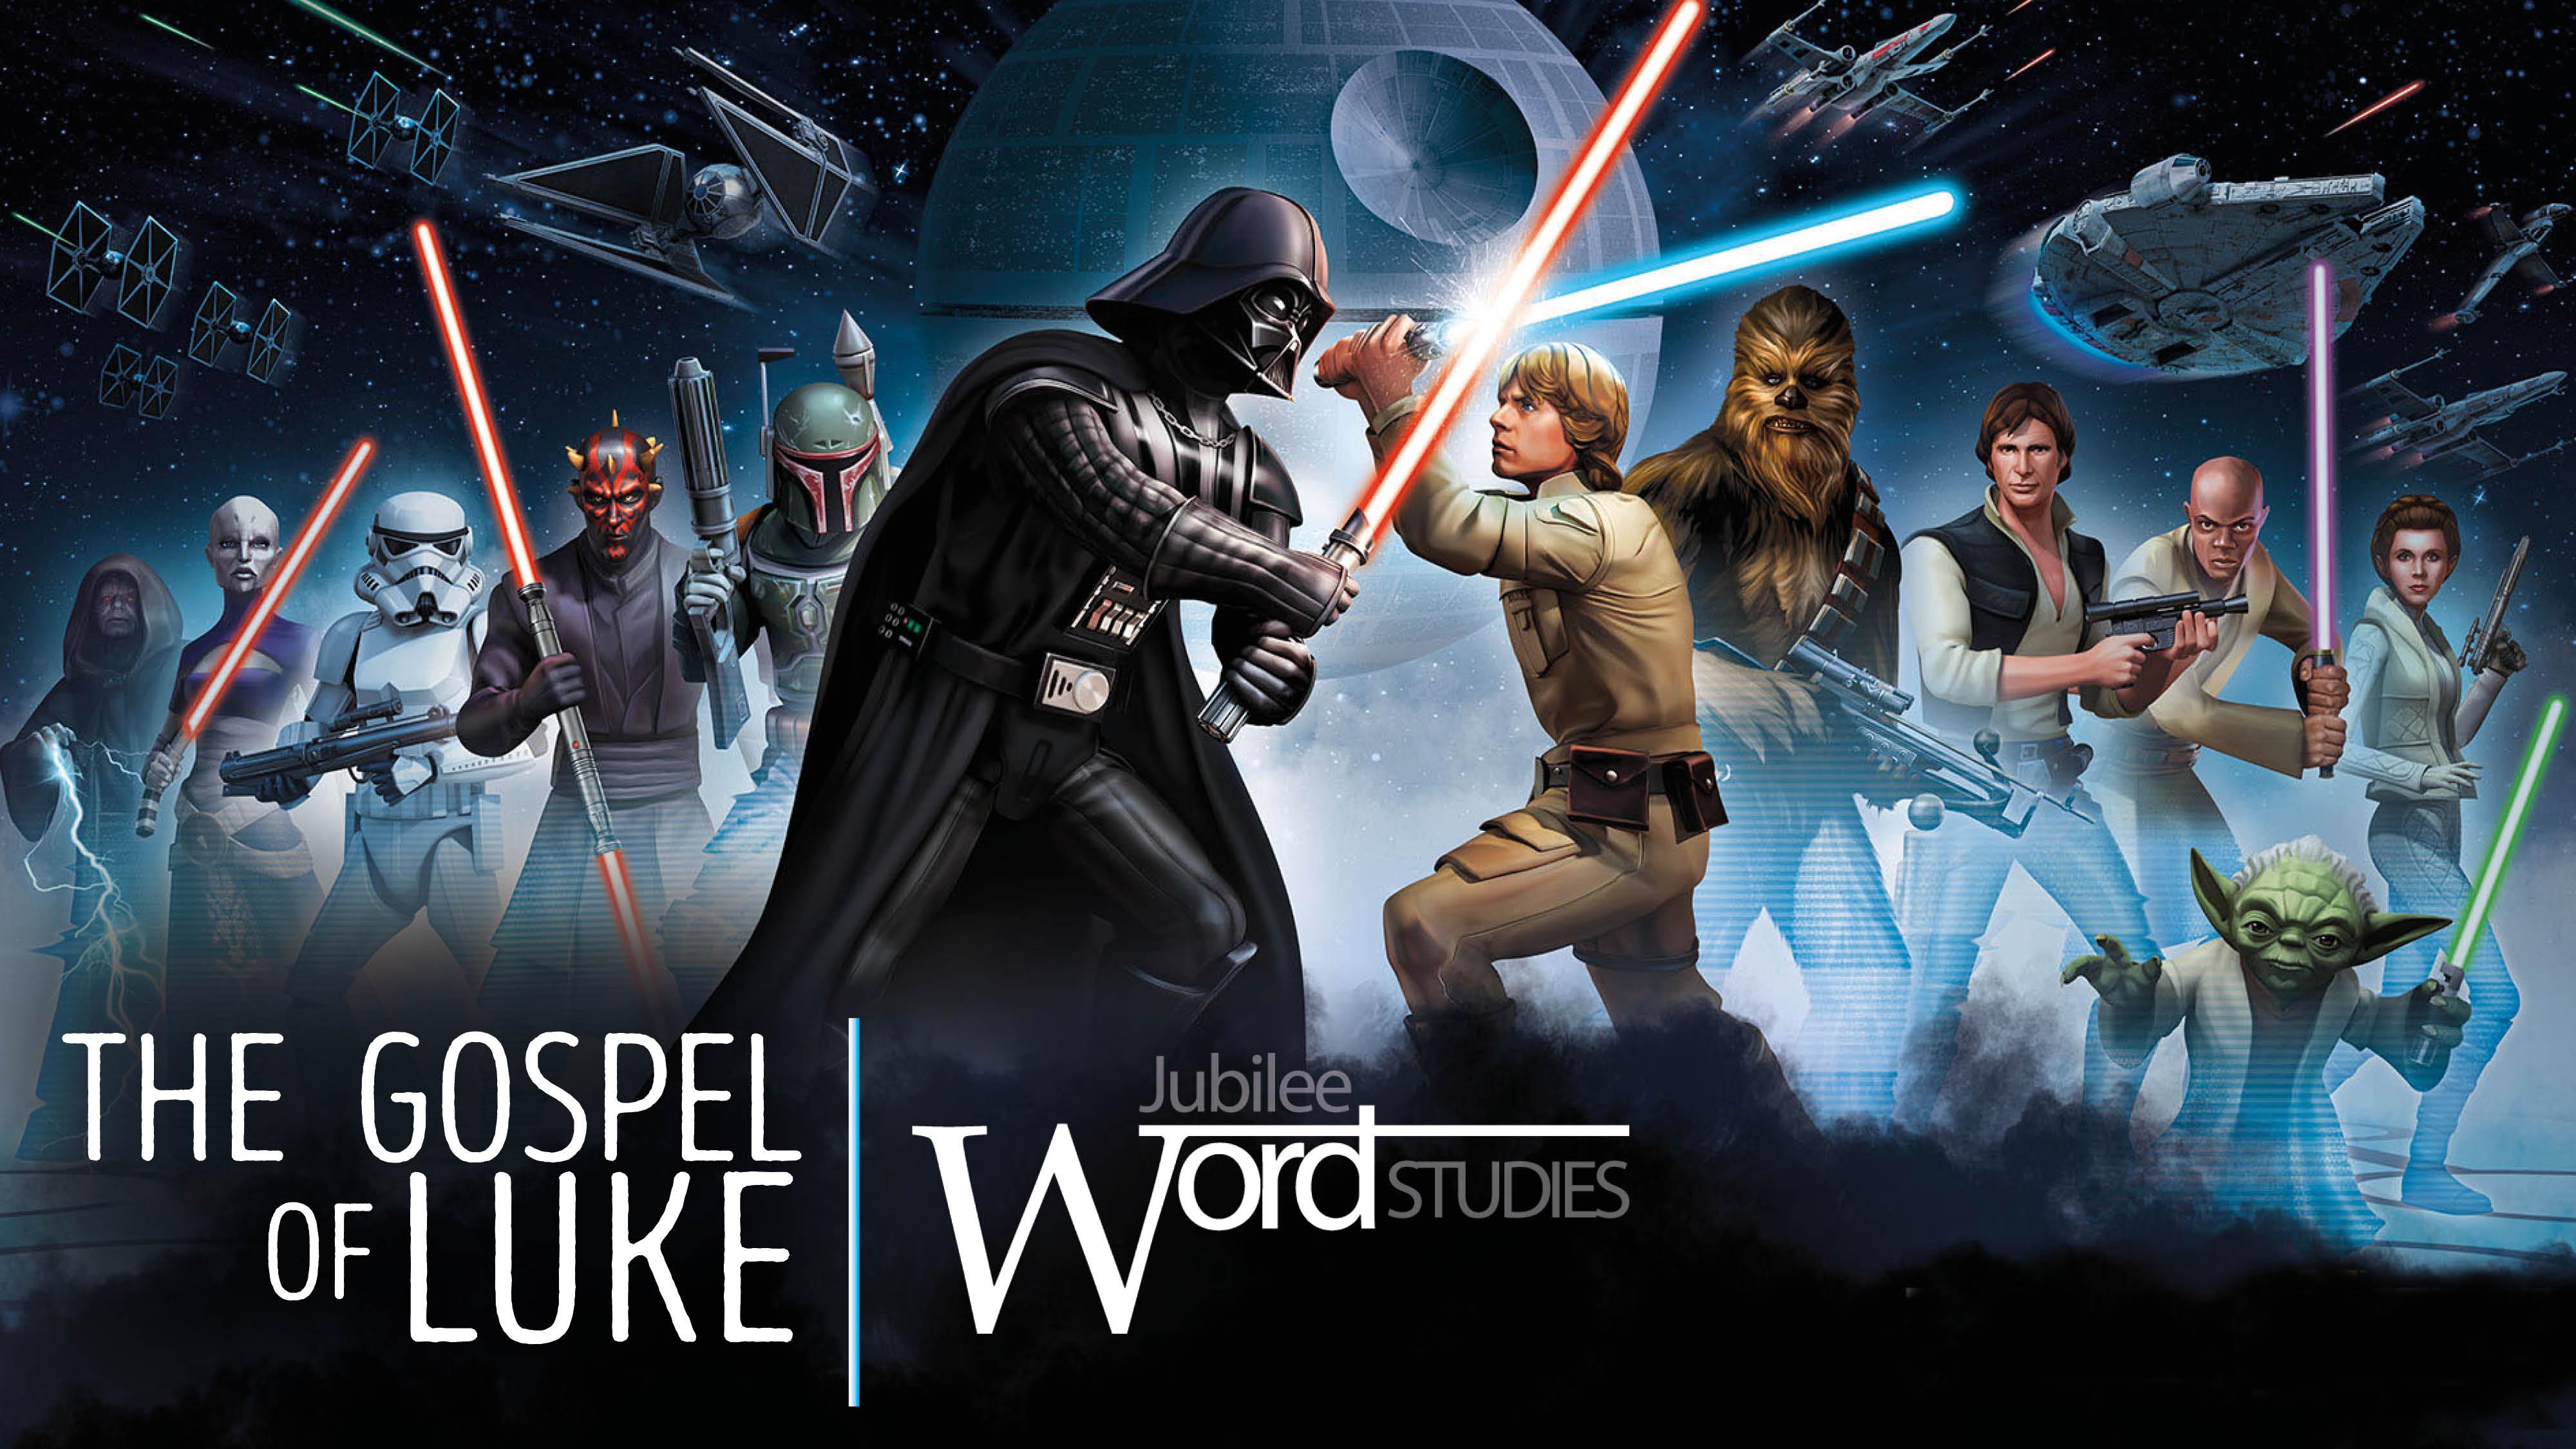 SOTW Word Studies: The Gospel of Luke